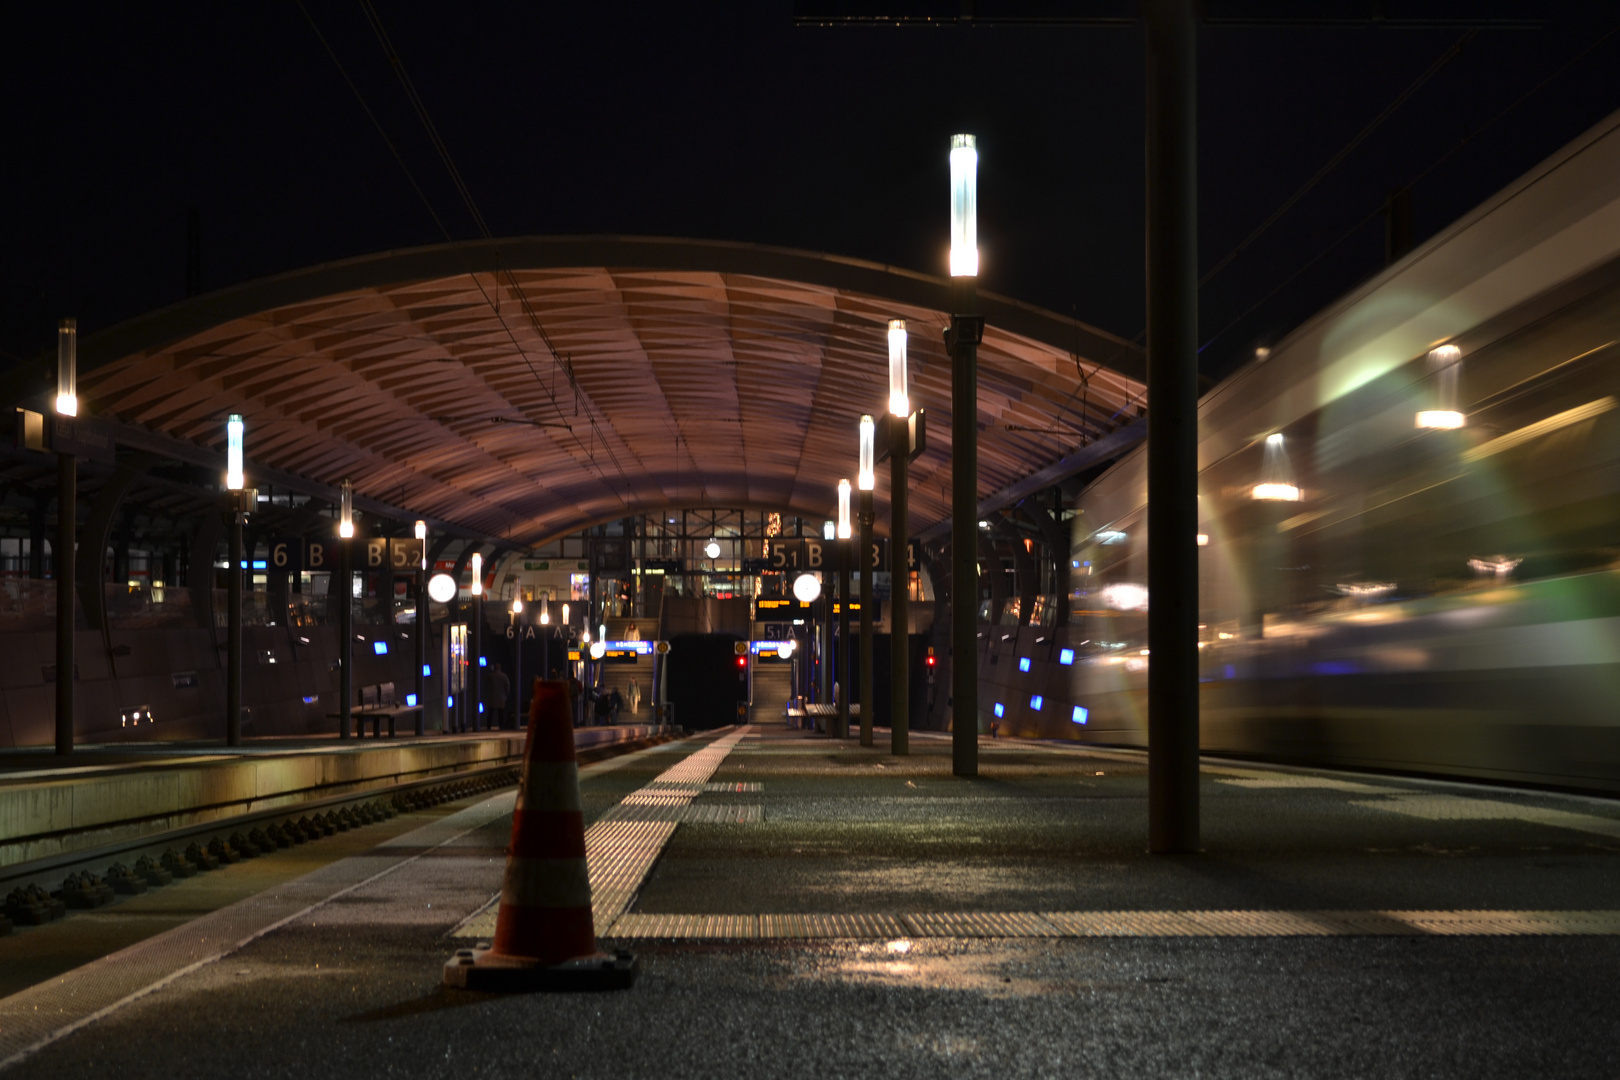 RegioTram Station Kassel Hauptbahnhof